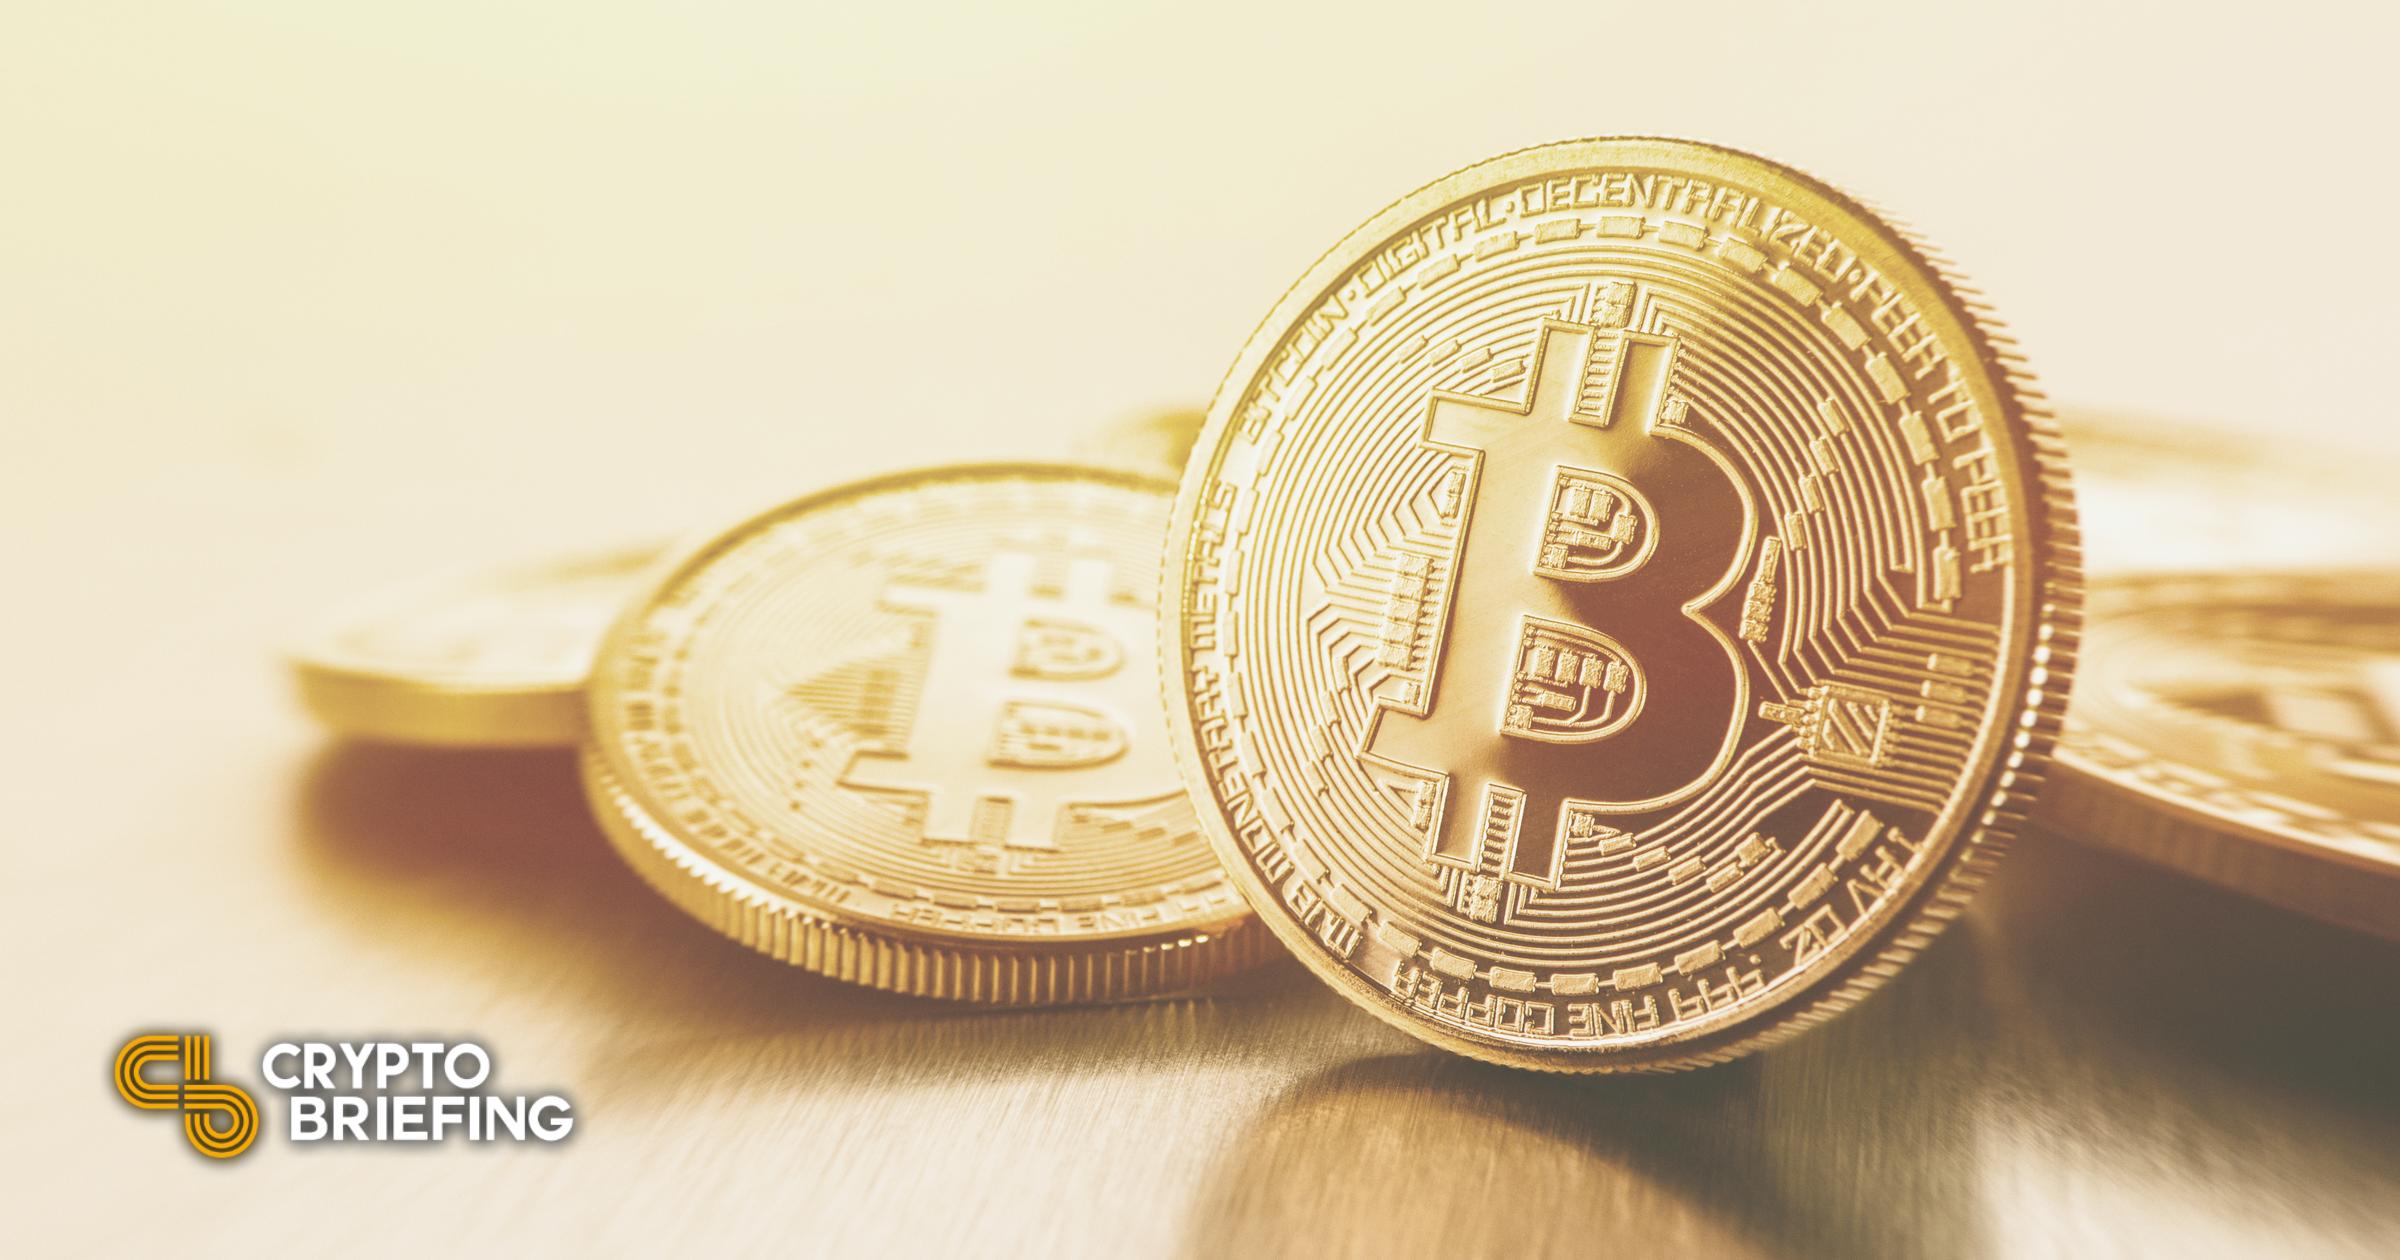 # 5 cele mai bune Cryptocurrency Brokers () ++ Real comparație